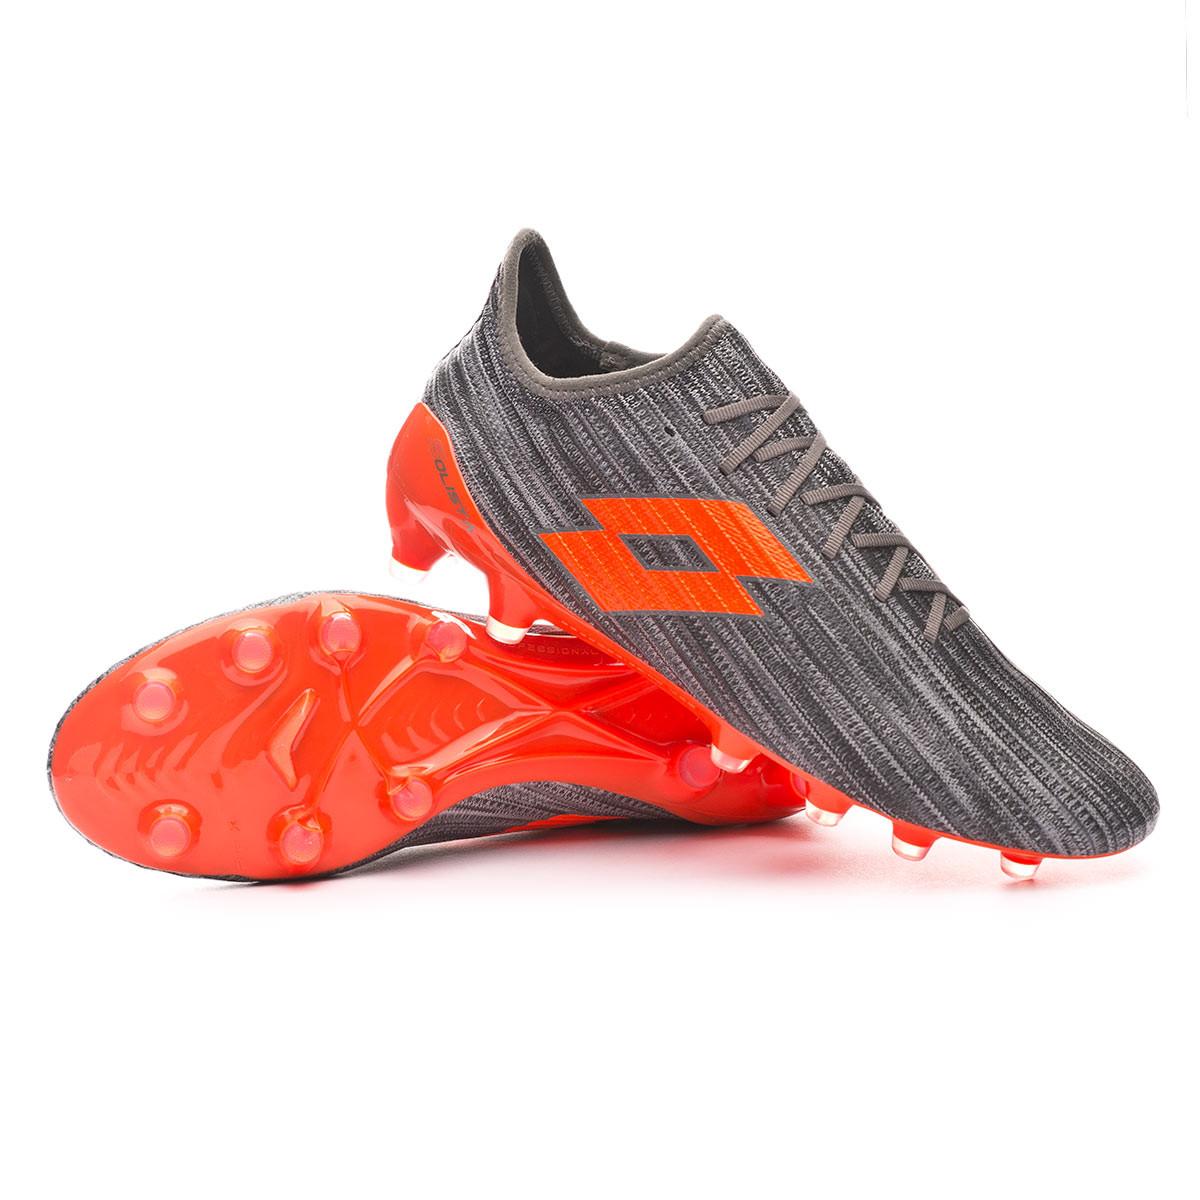 Zapatos de fútbol Lotto Solista 200 III FG